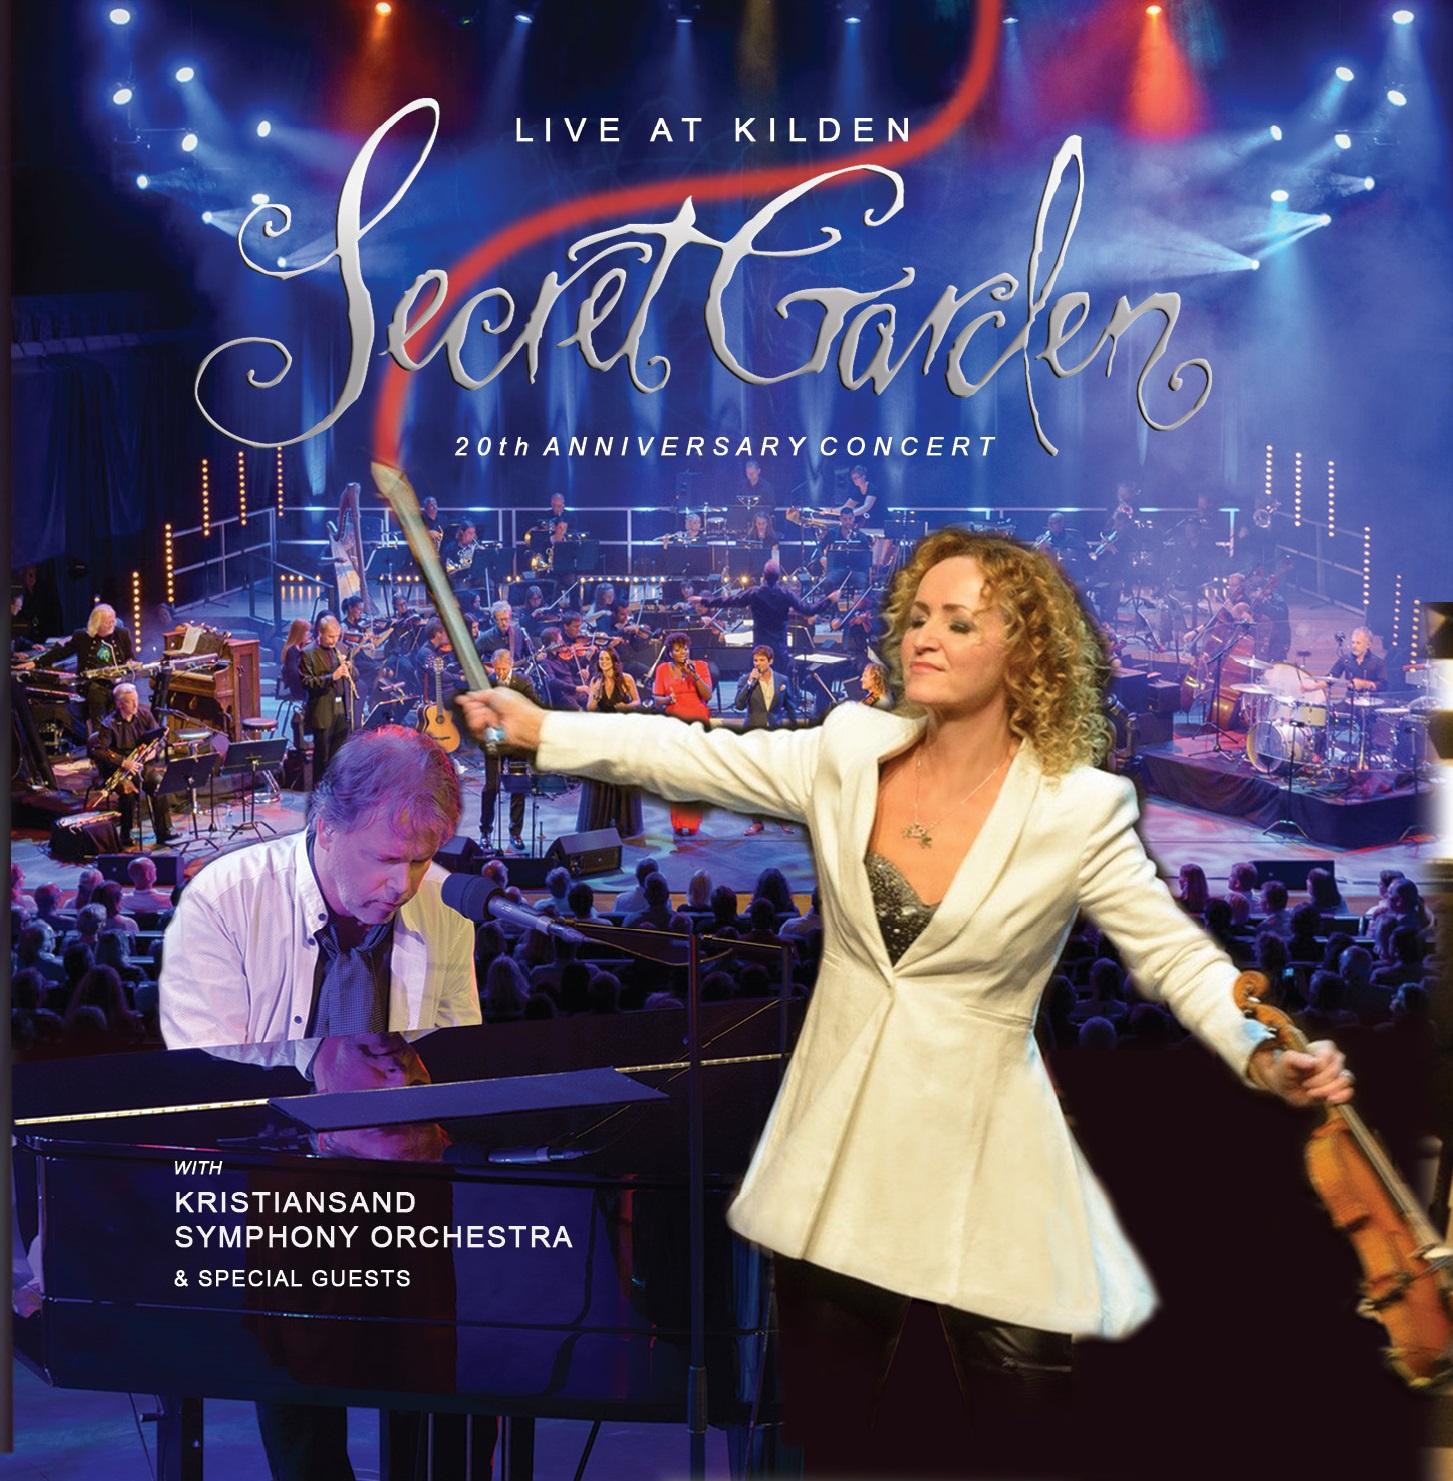 Secret Garden (시크릿 가든) - LIVE AT KILDEN (20th Anniversary Concert)